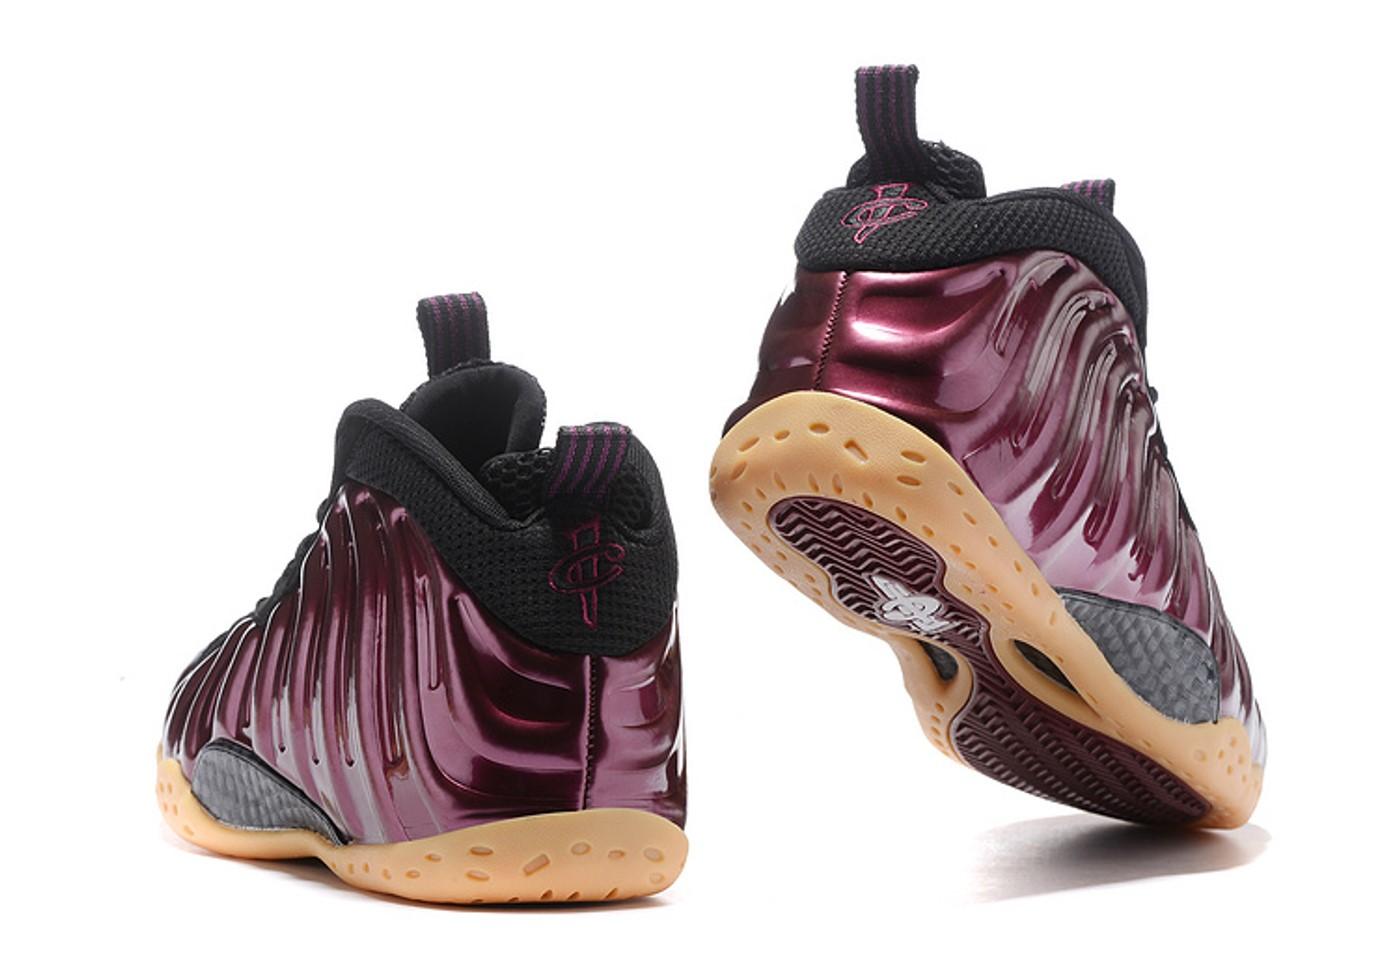 super popular e179e 5c9bb Nike Air Foamposite One Night Maroon Gum Light Brown Black 314996 ...